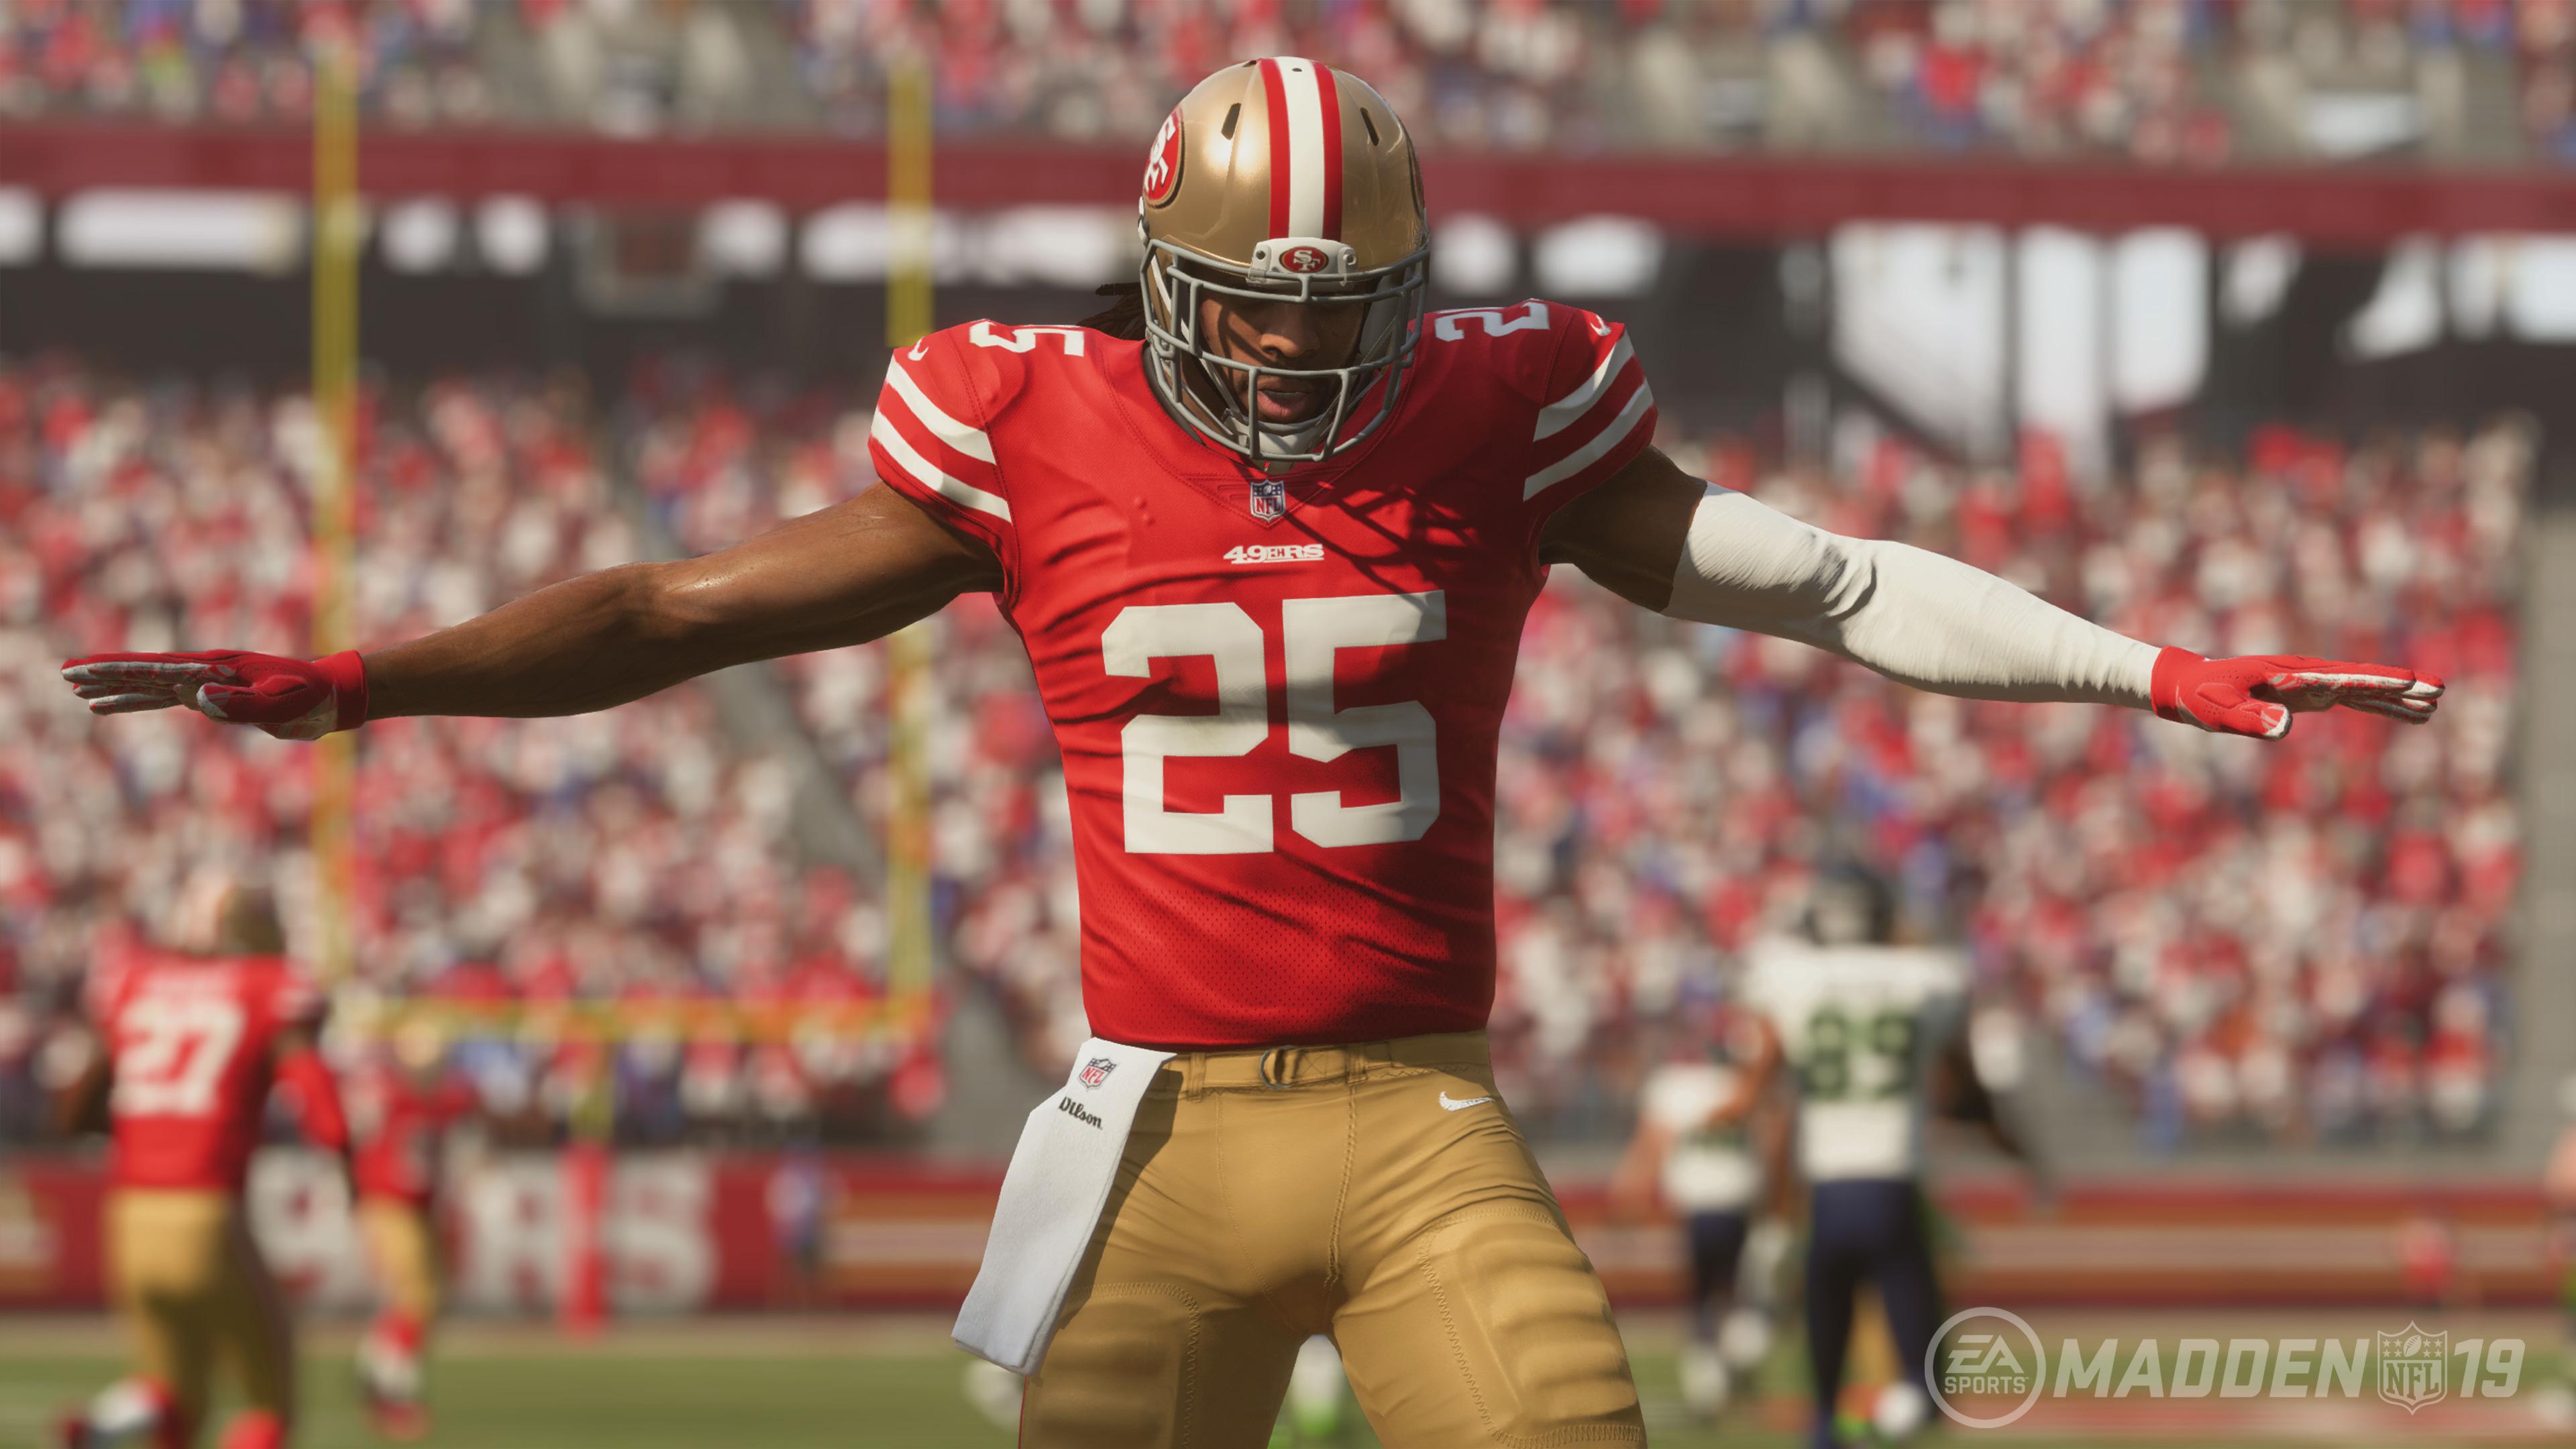 Madden NFL 19 Sports Video Game E3 2018 3840x2400 Wallpaper